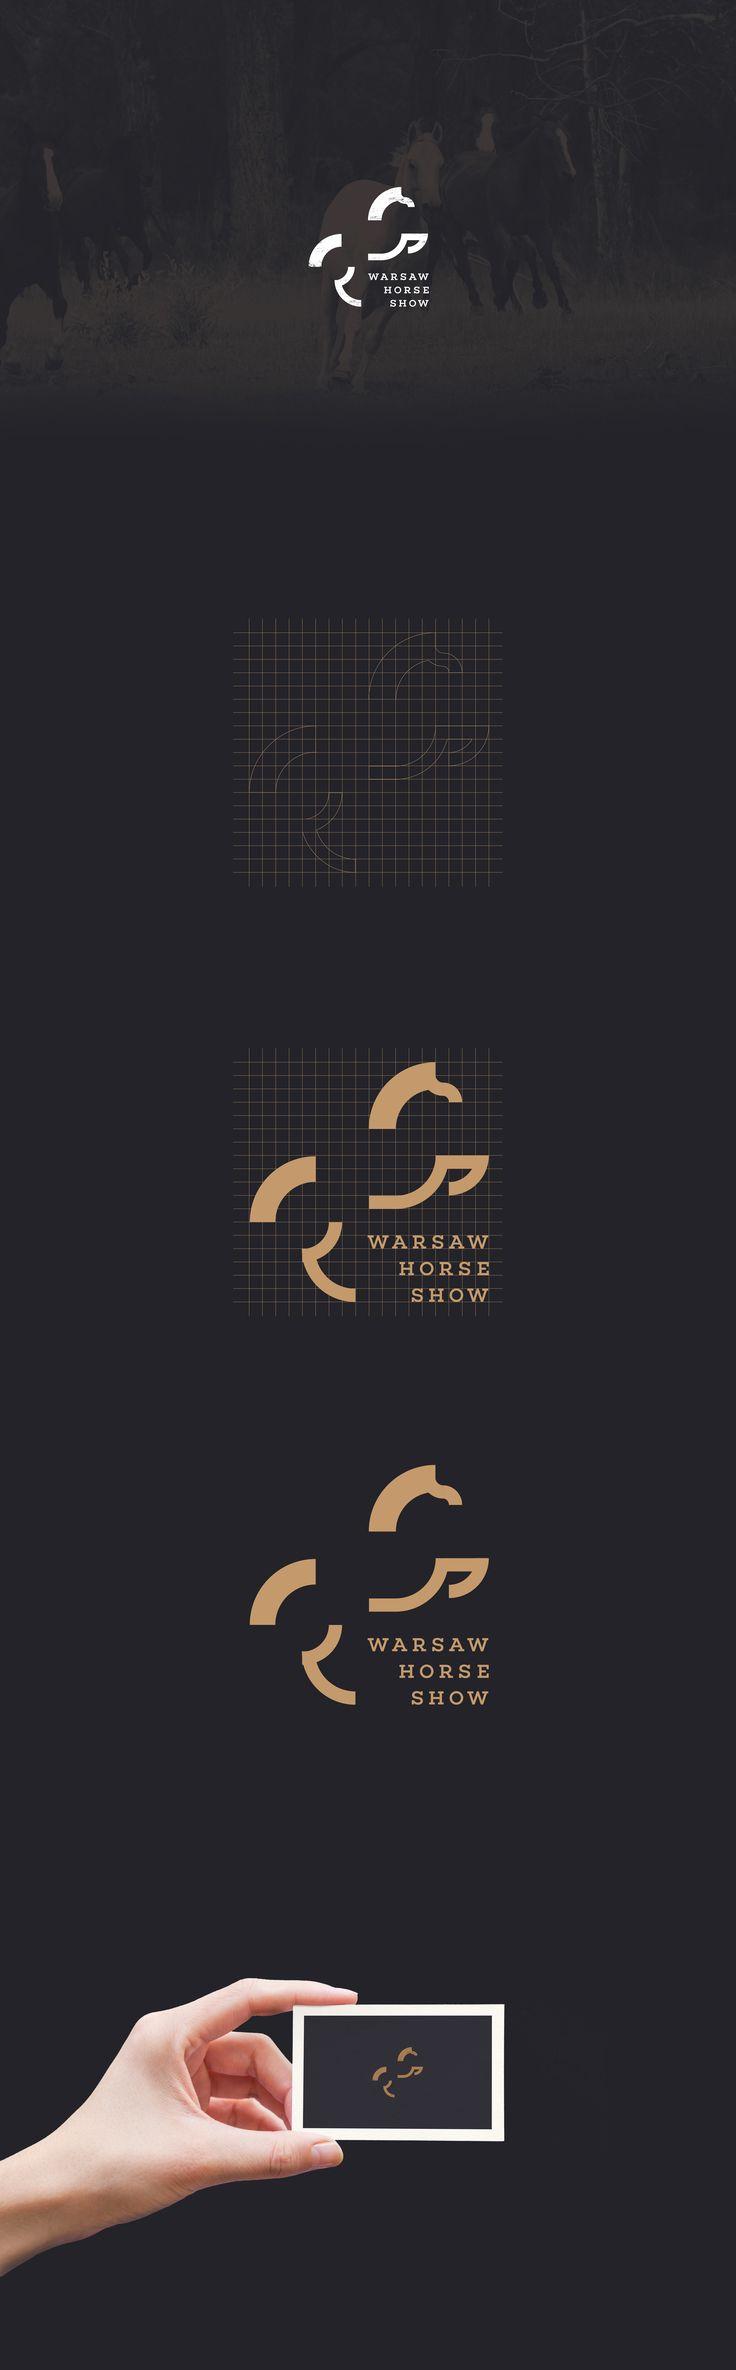 Simple logo and branding for Warsaw Horse Show. Igor Kubik logo design